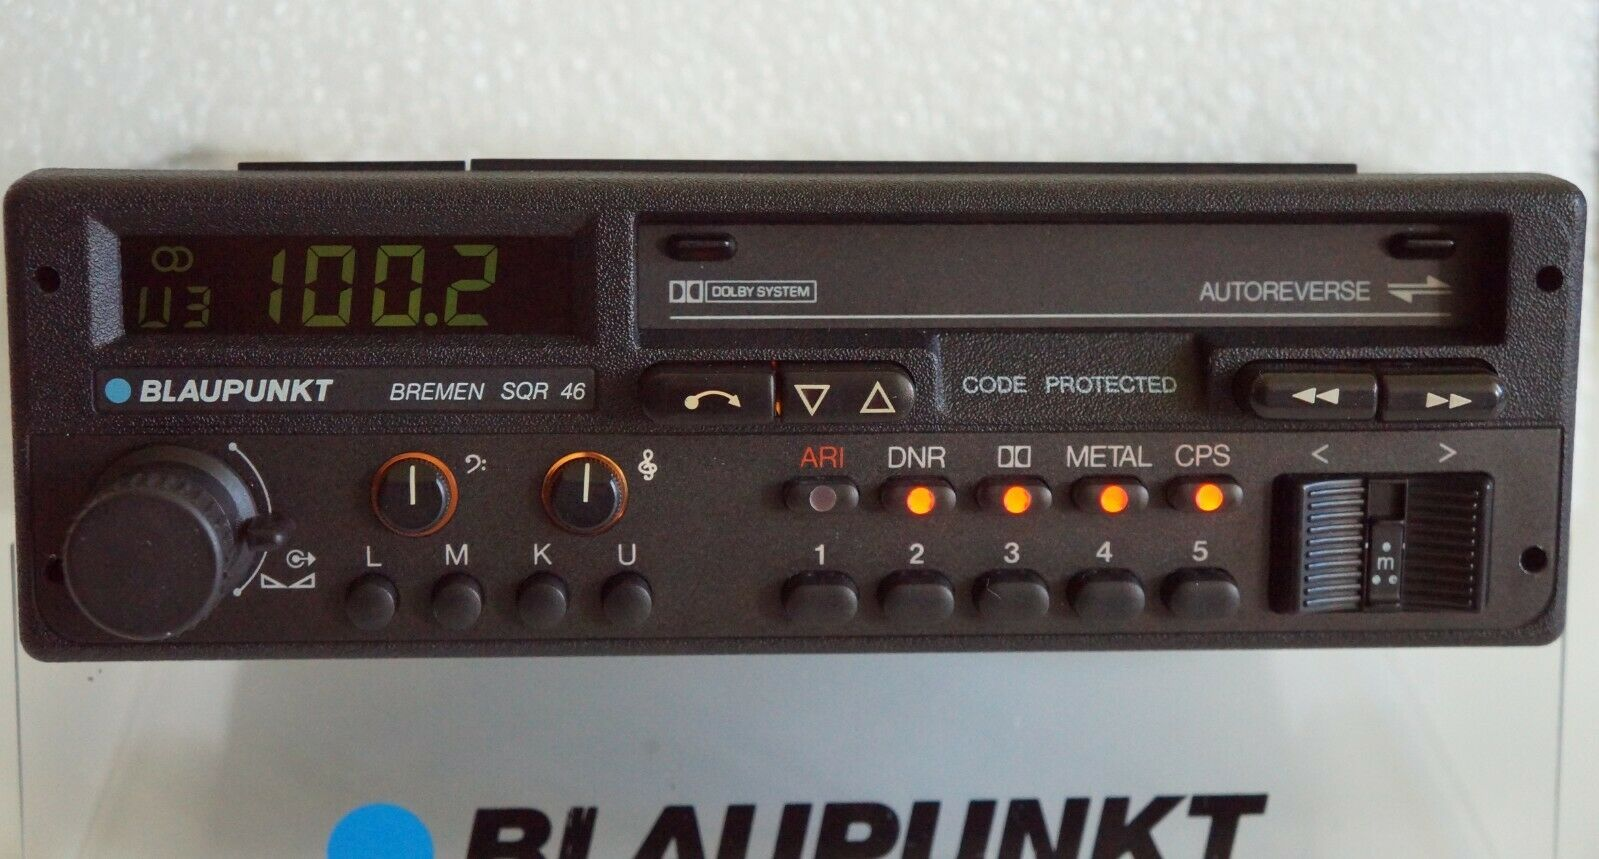 Blaupunkt Bremen SQR 46 Noir Tape FM Player